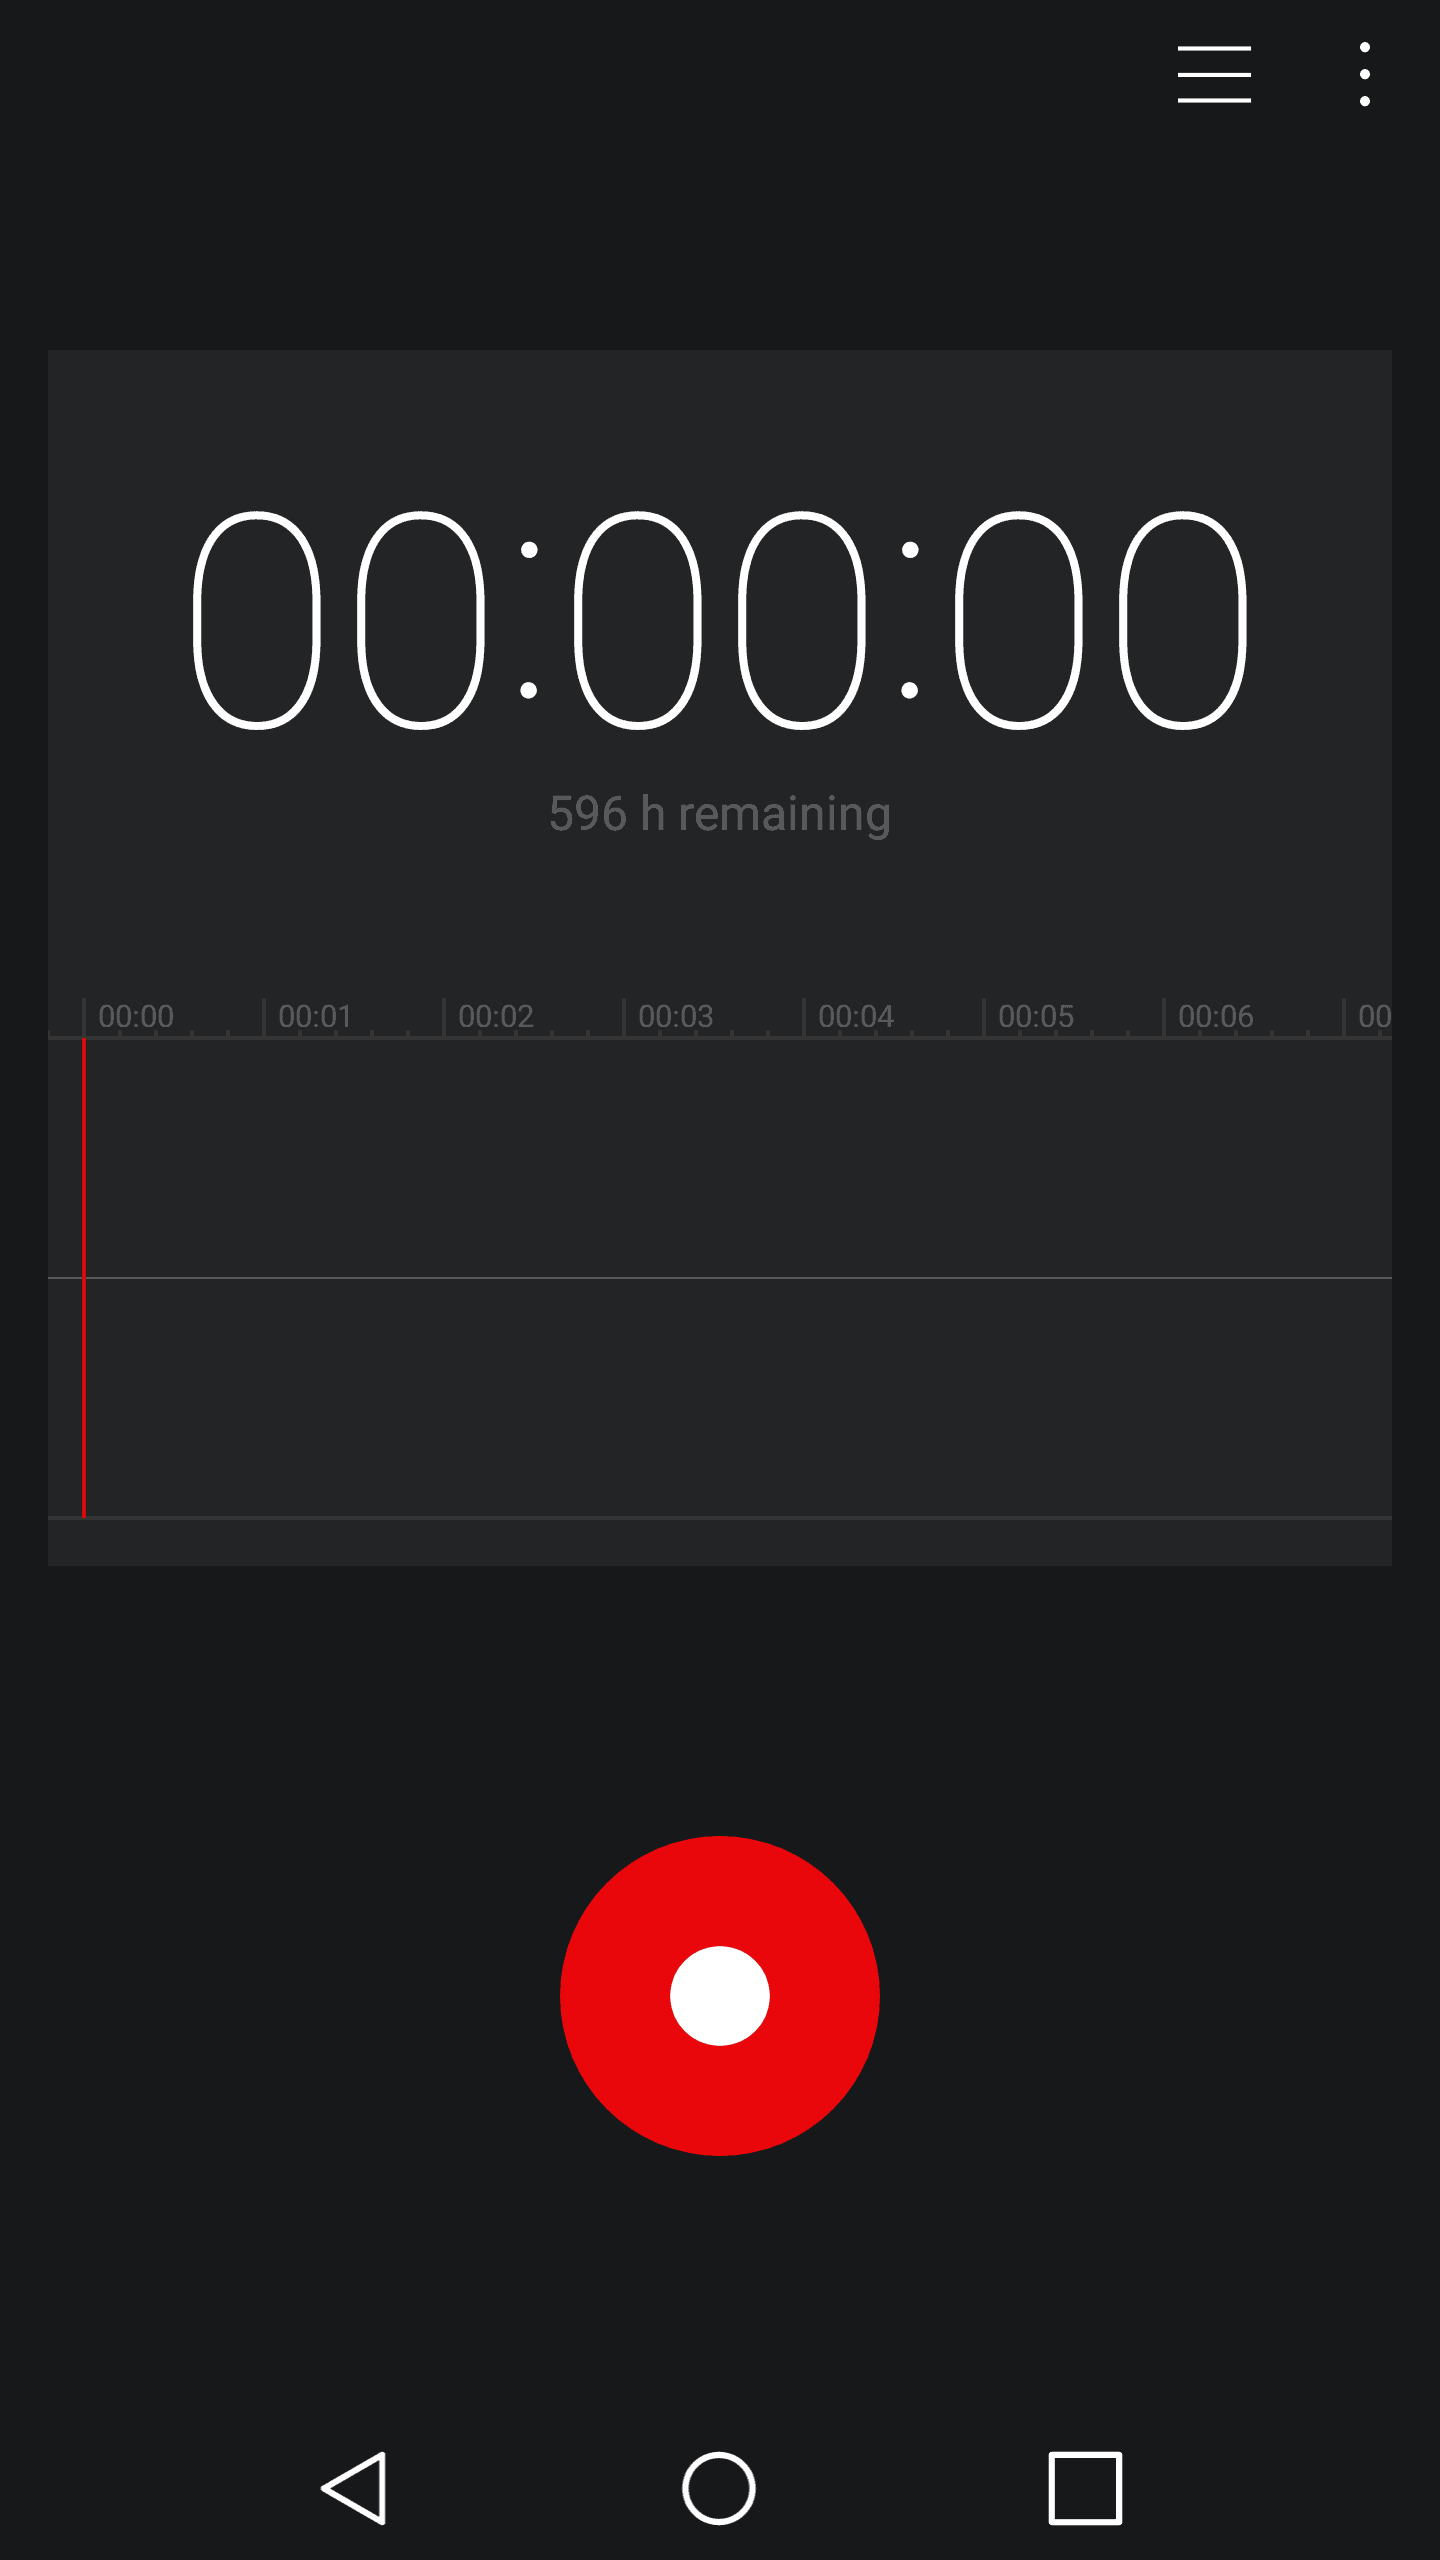 LG V20 AH NS screenshots hd audio record 01